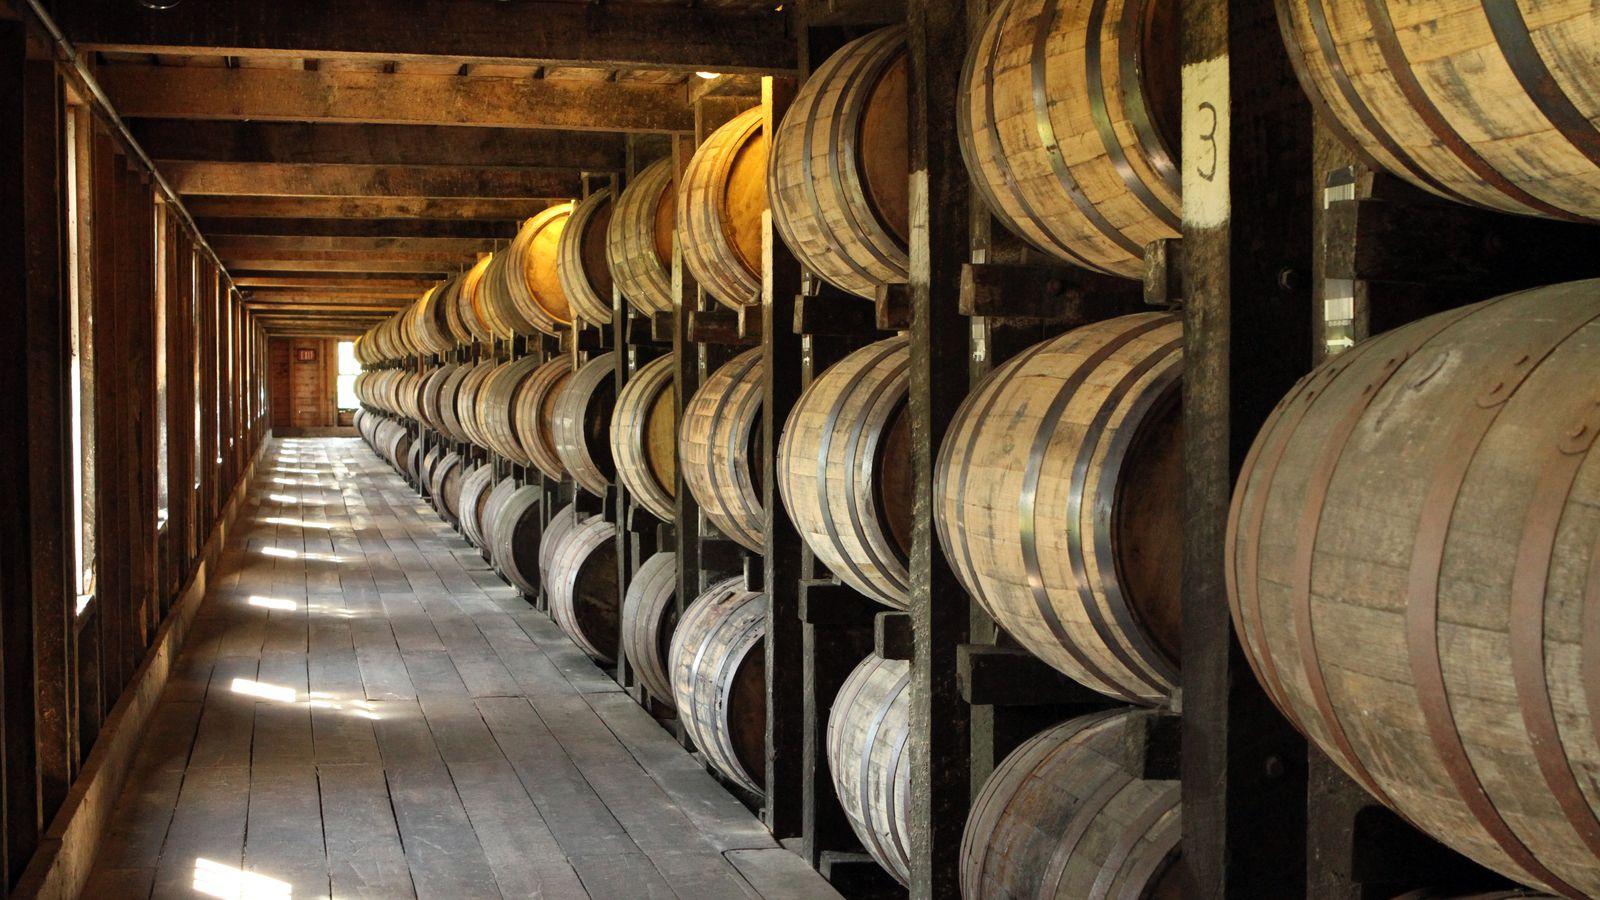 Barrels_in_warehouse_photo_courtesy_of_kentucky_distillers_association.0